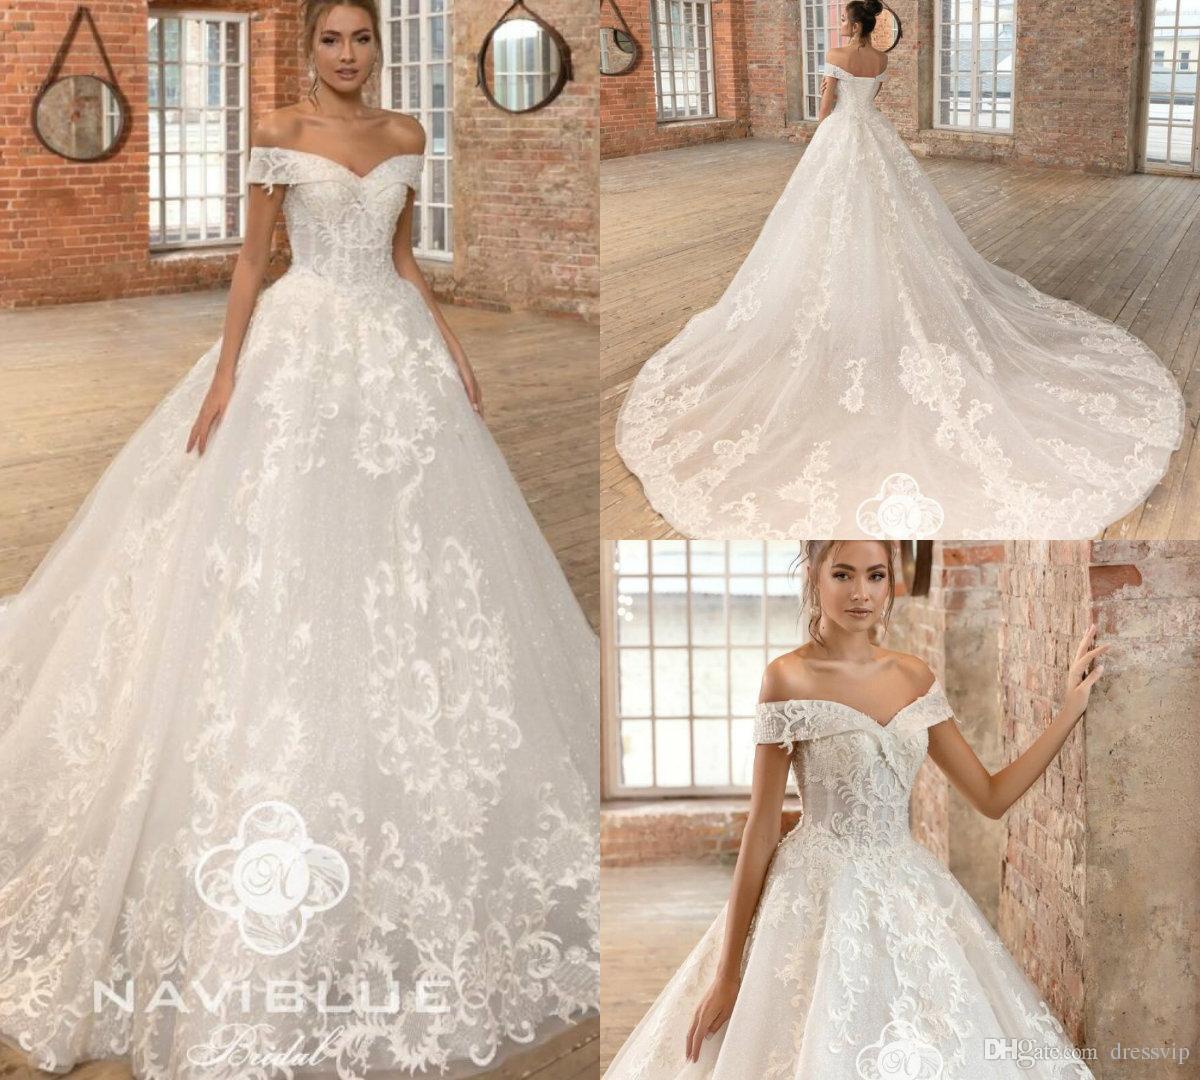 ccaa541407d Discount 2019 Naviblue Dolly Beach Wedding Dresses Off The Shoulder Lace  Appliqued A Line Glitter Modest Wedding Dress Court Train Bridal Gowns  Wedding ...